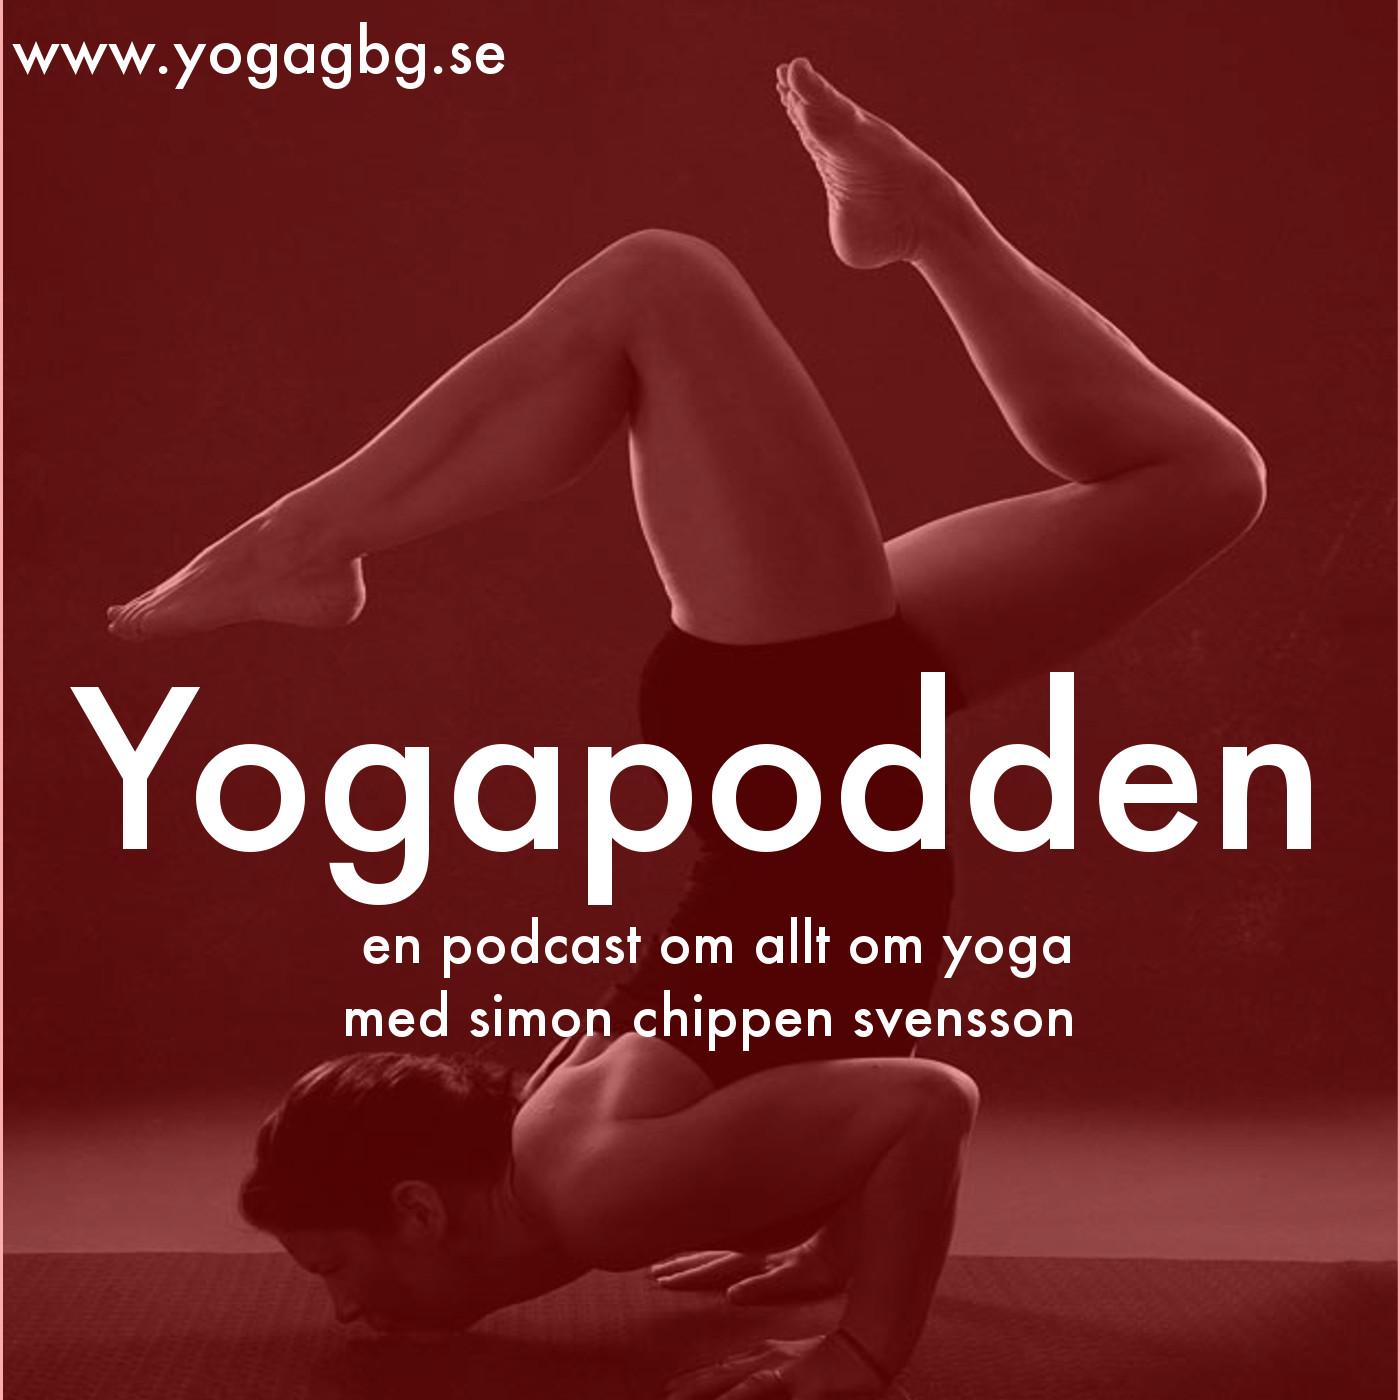 Yogapodden logga